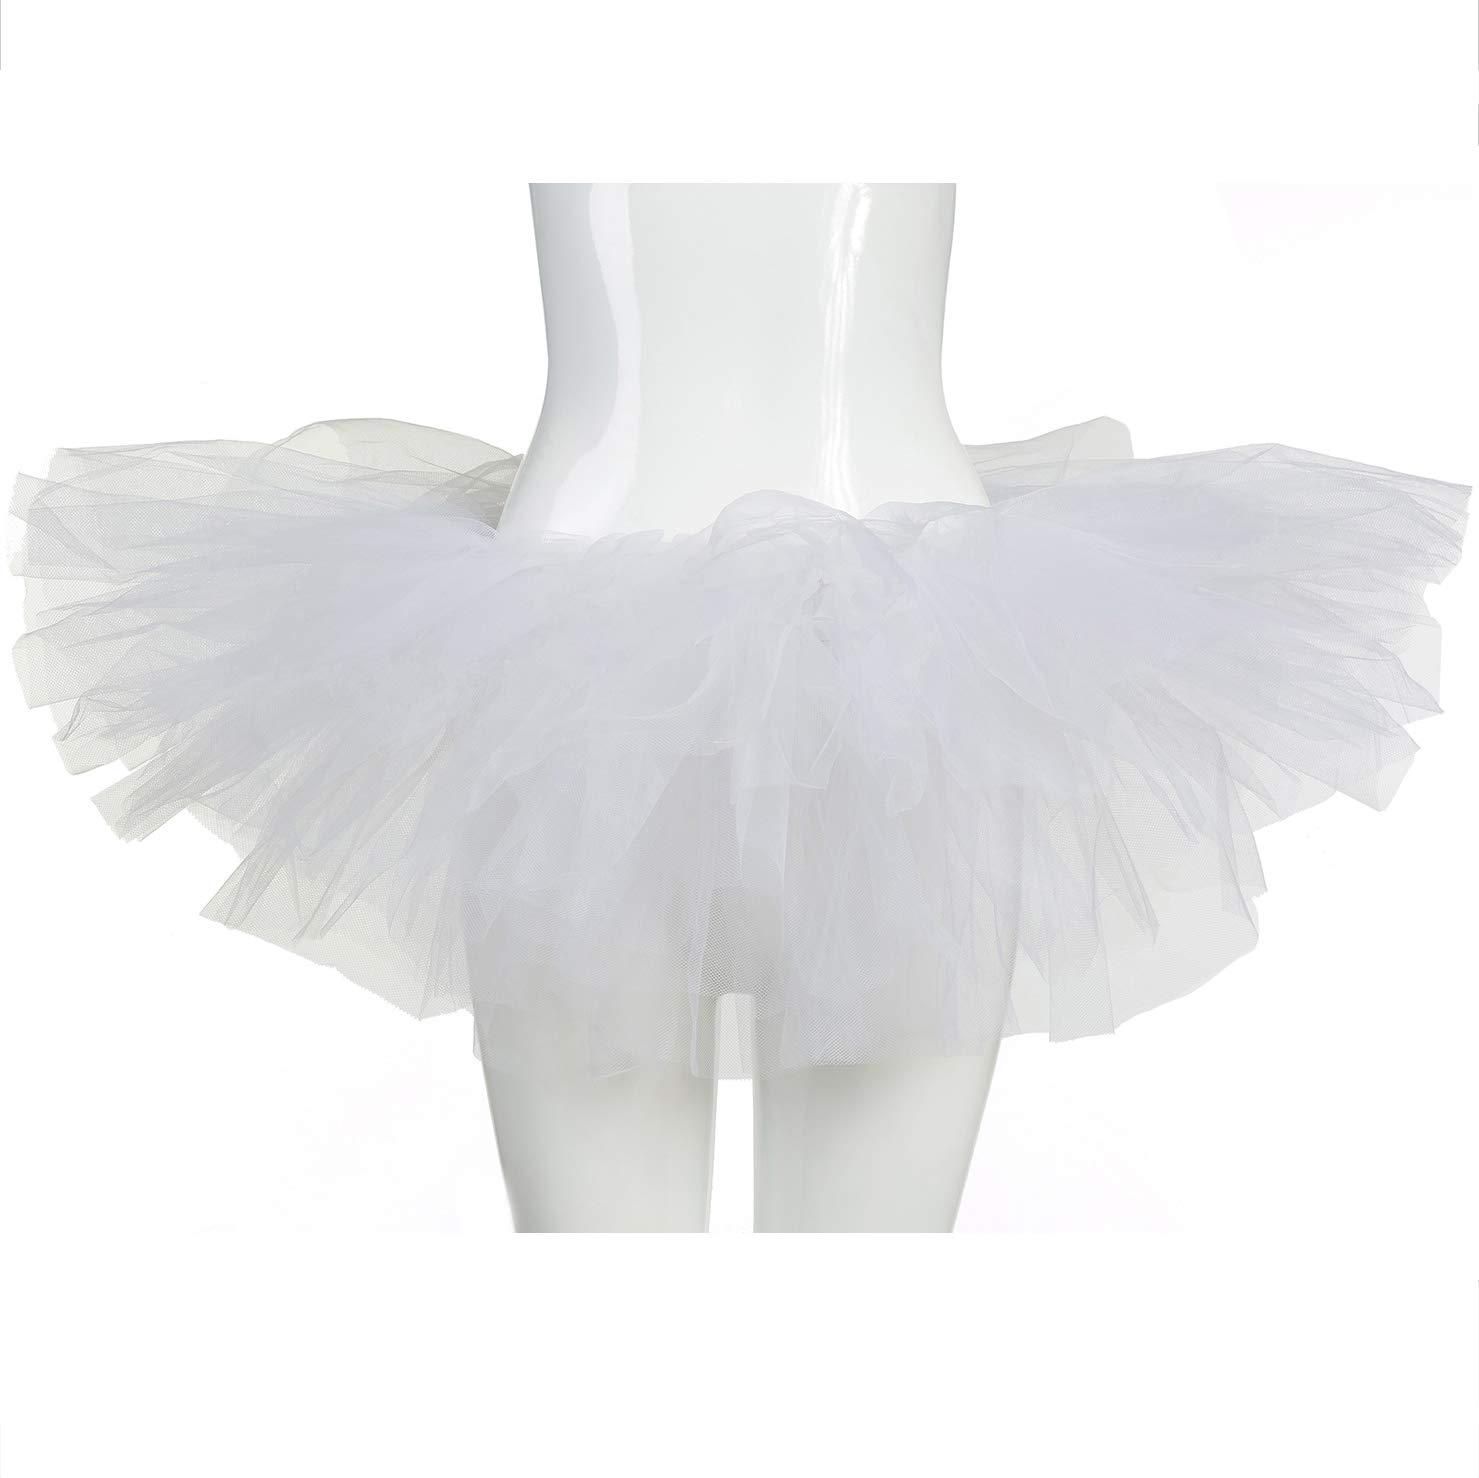 belababy White Women Skirt Classic 5 Layers Tulle Tutu